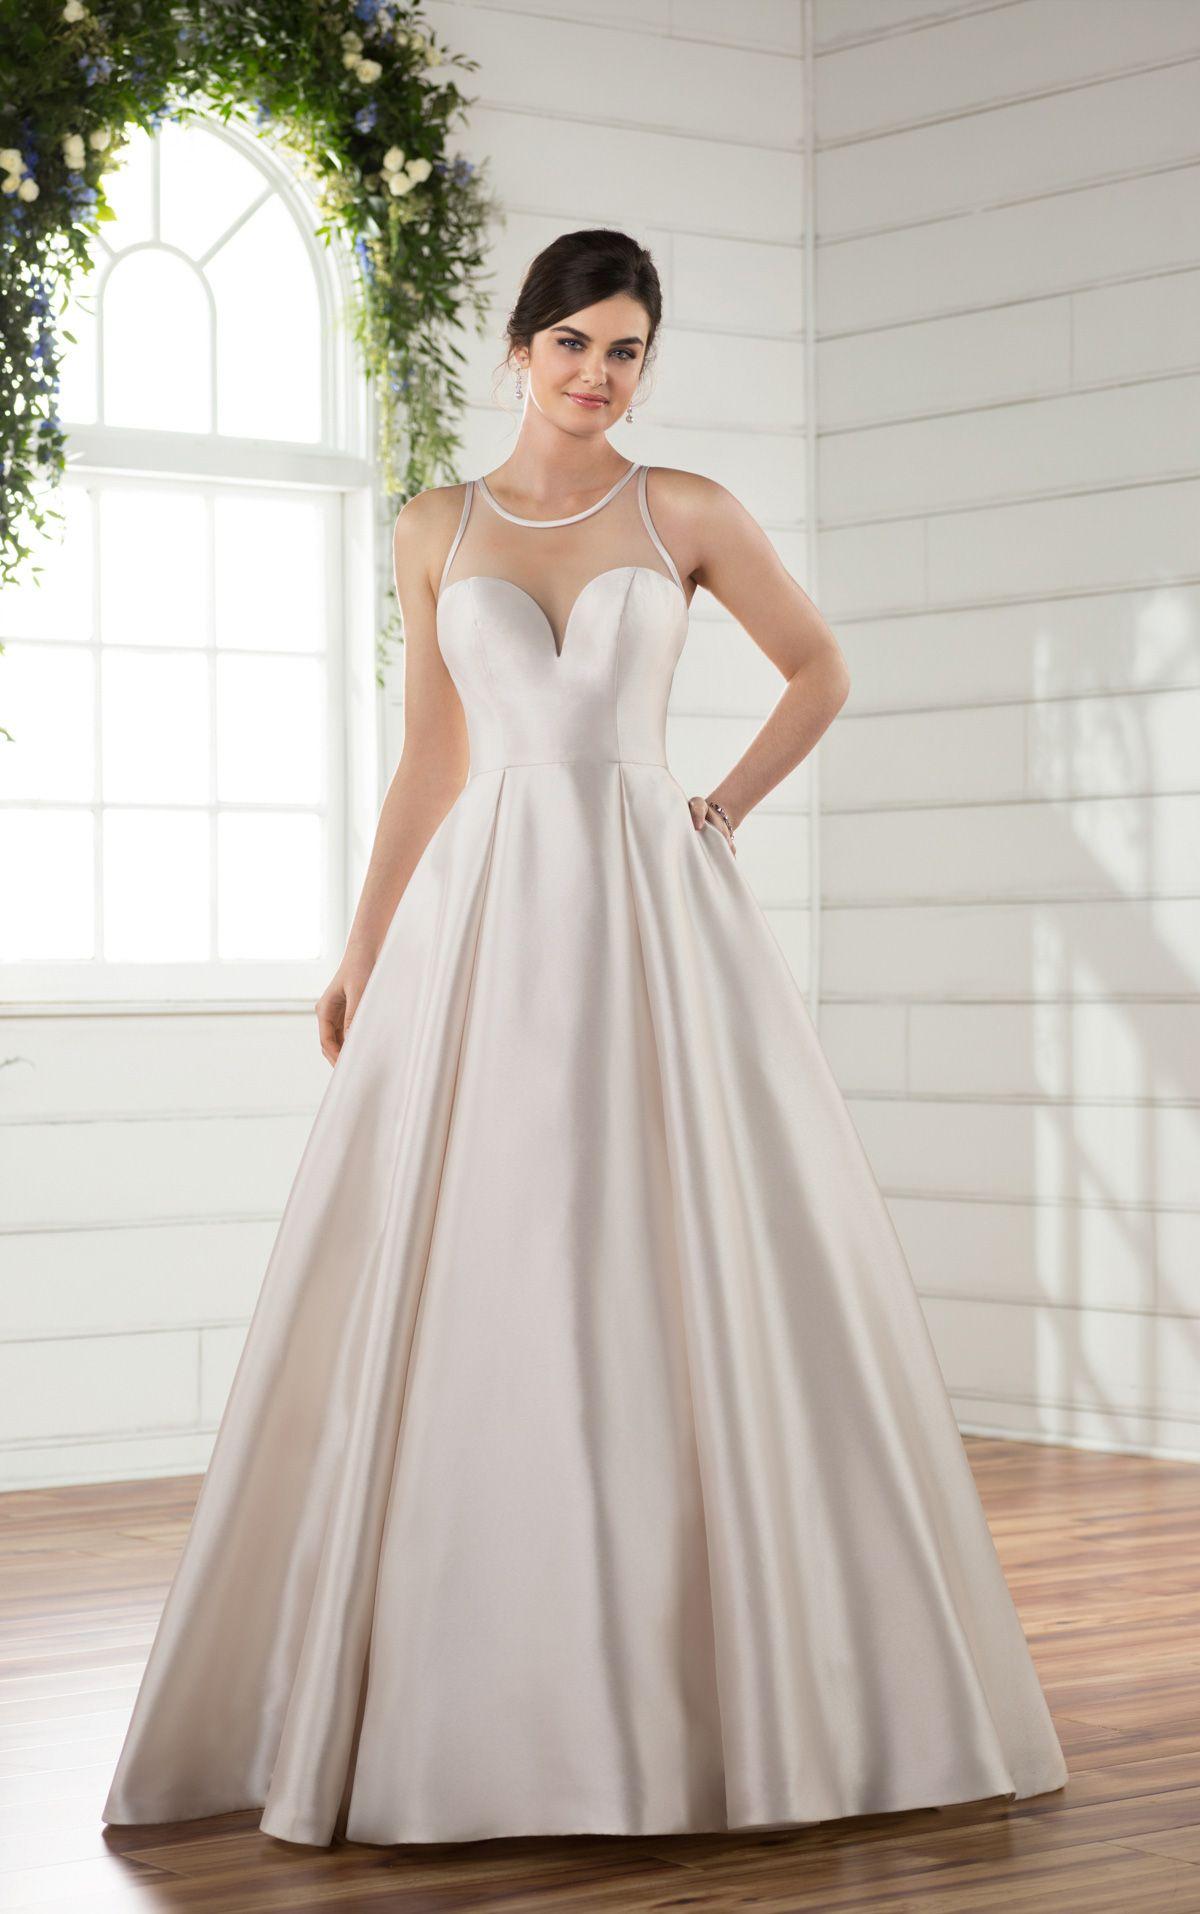 Wedding dresses ballgown wedding dress illusion neckline and